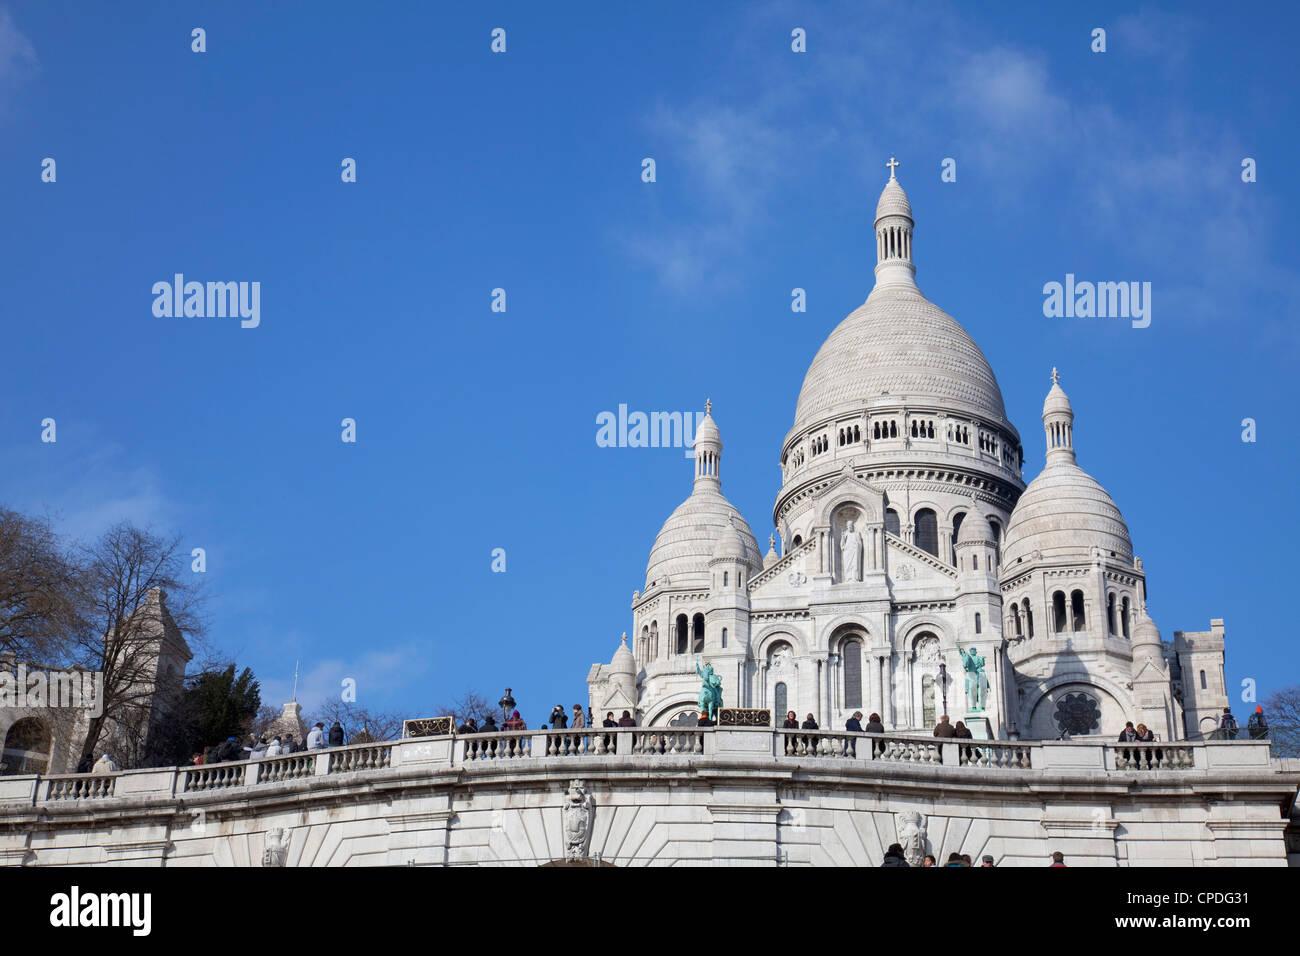 Sacre Coeur Basilica, Montmartre, Paris, France, Europe - Stock Image